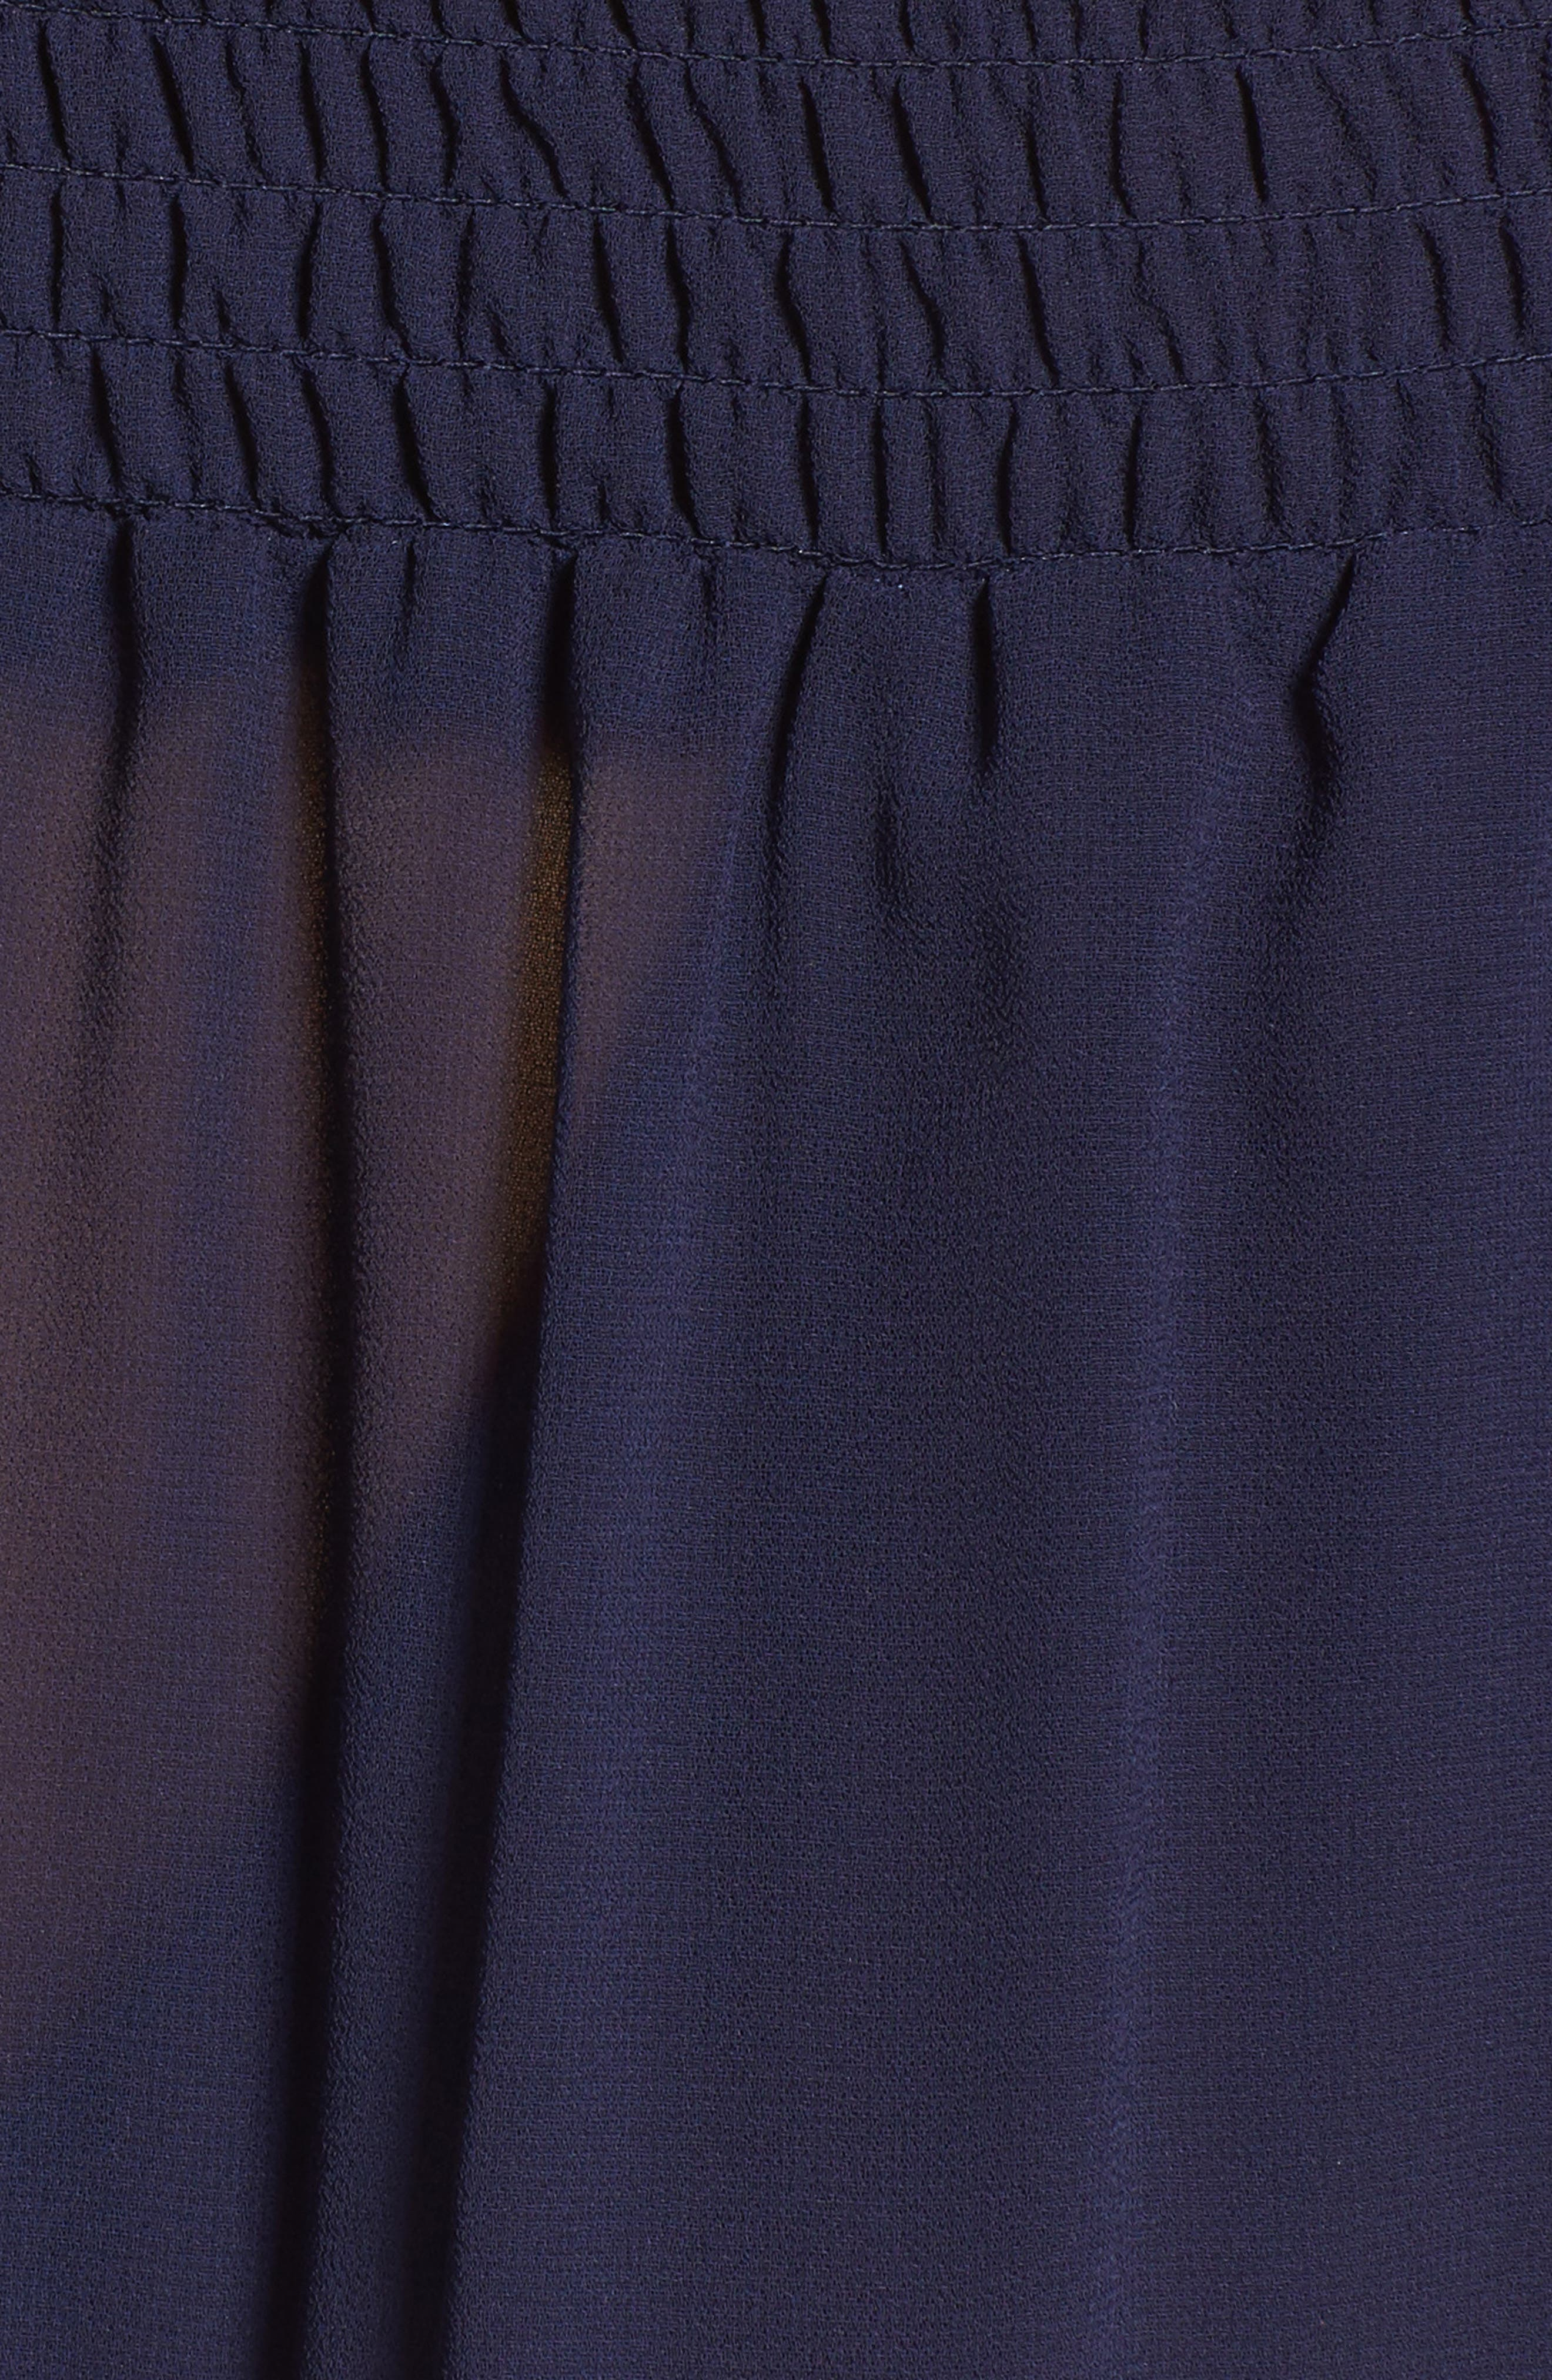 Off the Shoulder Popover Minidress,                             Alternate thumbnail 5, color,